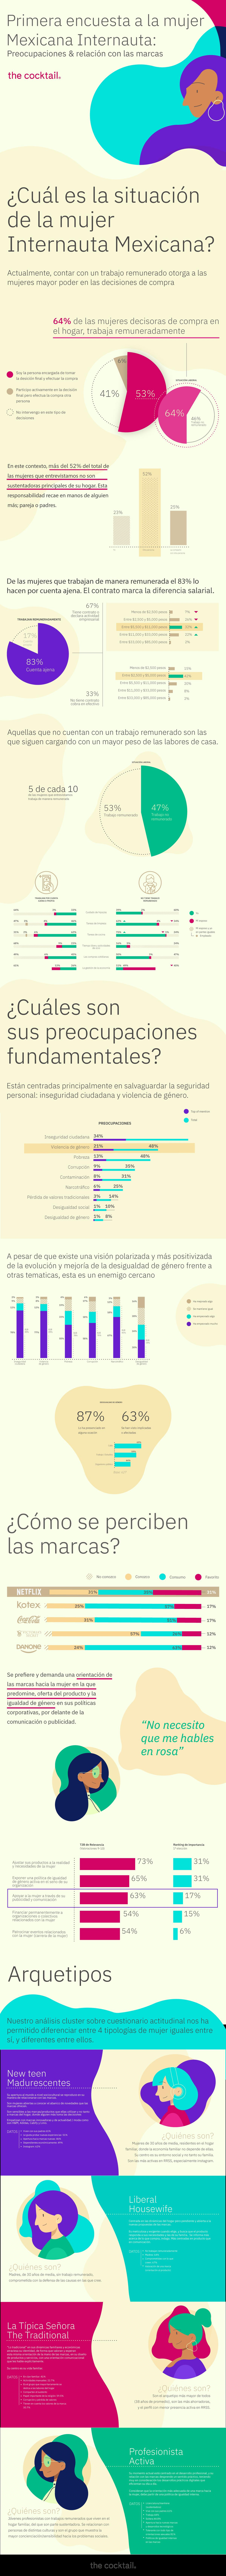 Primera encuesta a la mujer mexicana internauta